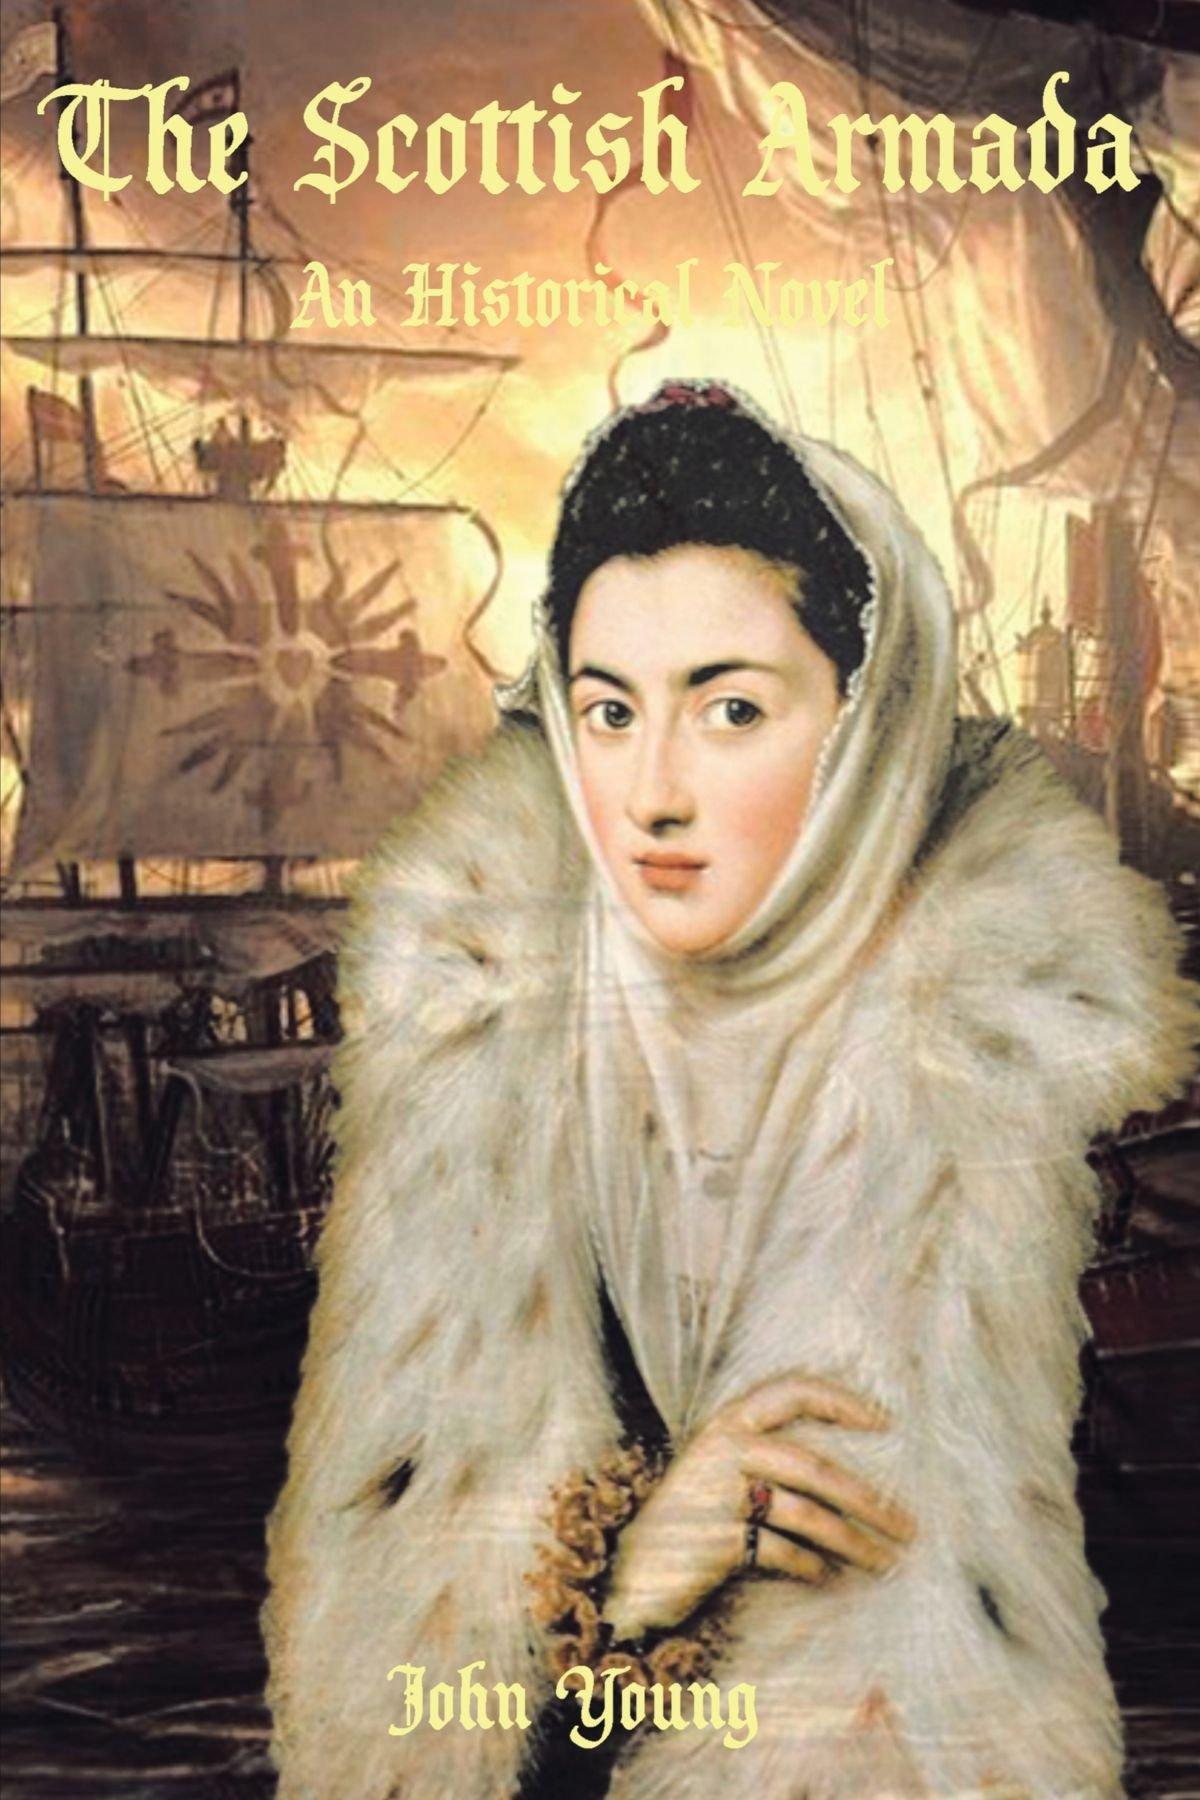 Read Online The Scottish Armada: An Historical Novel pdf epub